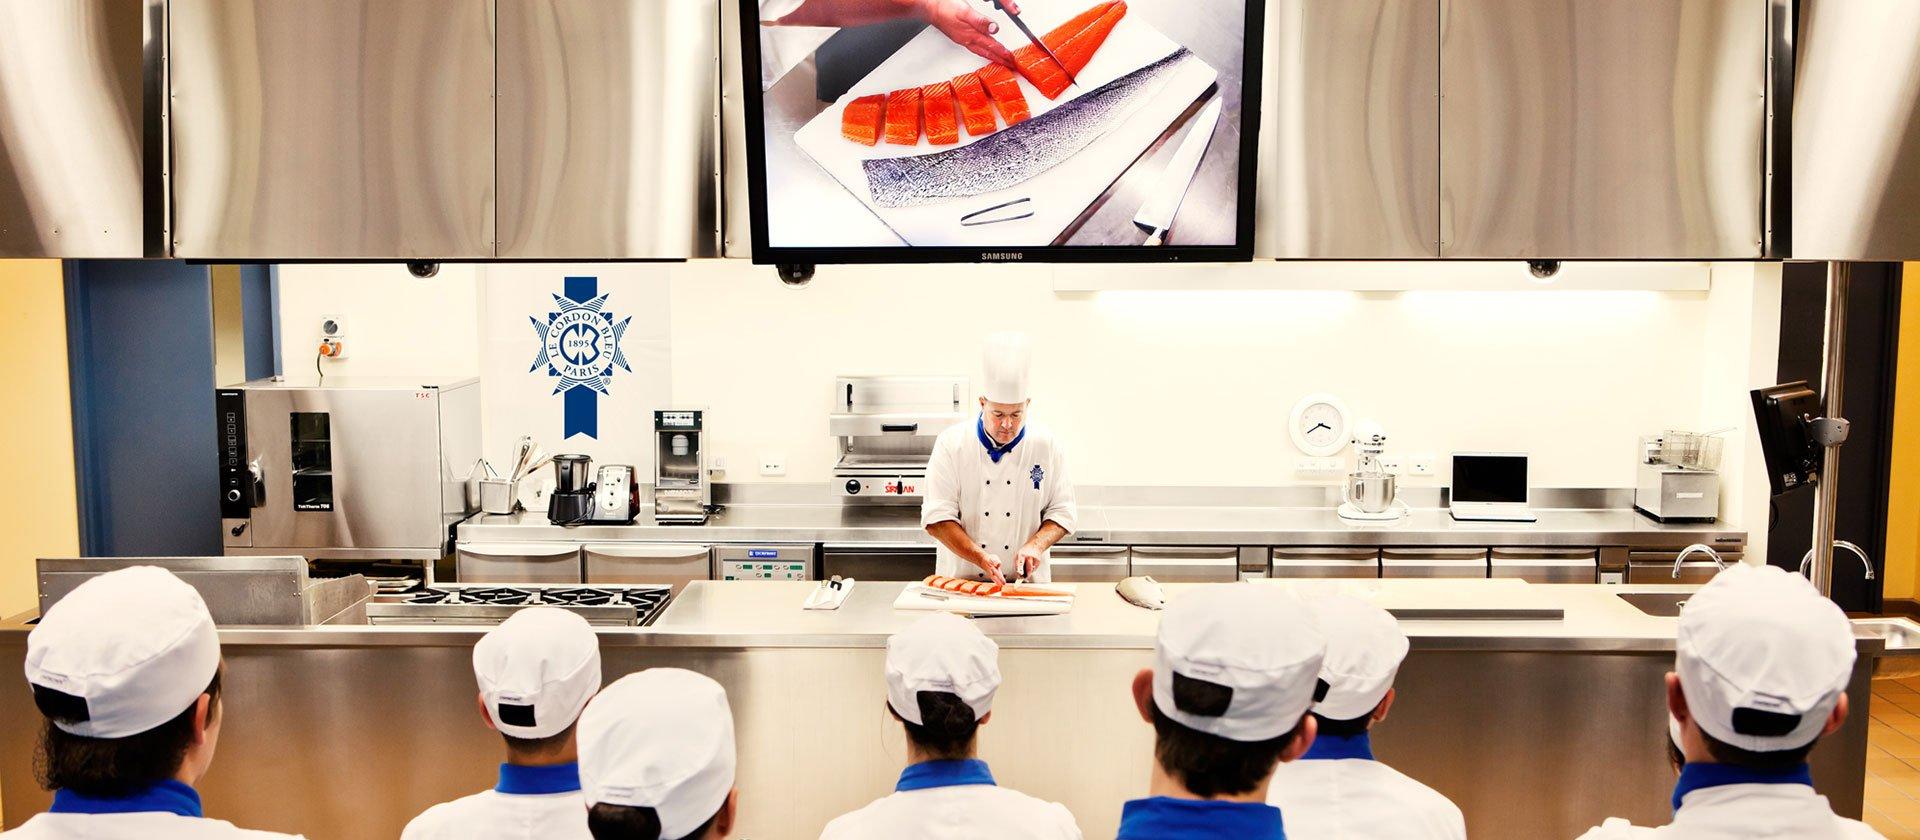 Le Cordon Bleu Australia demonstration kitchen